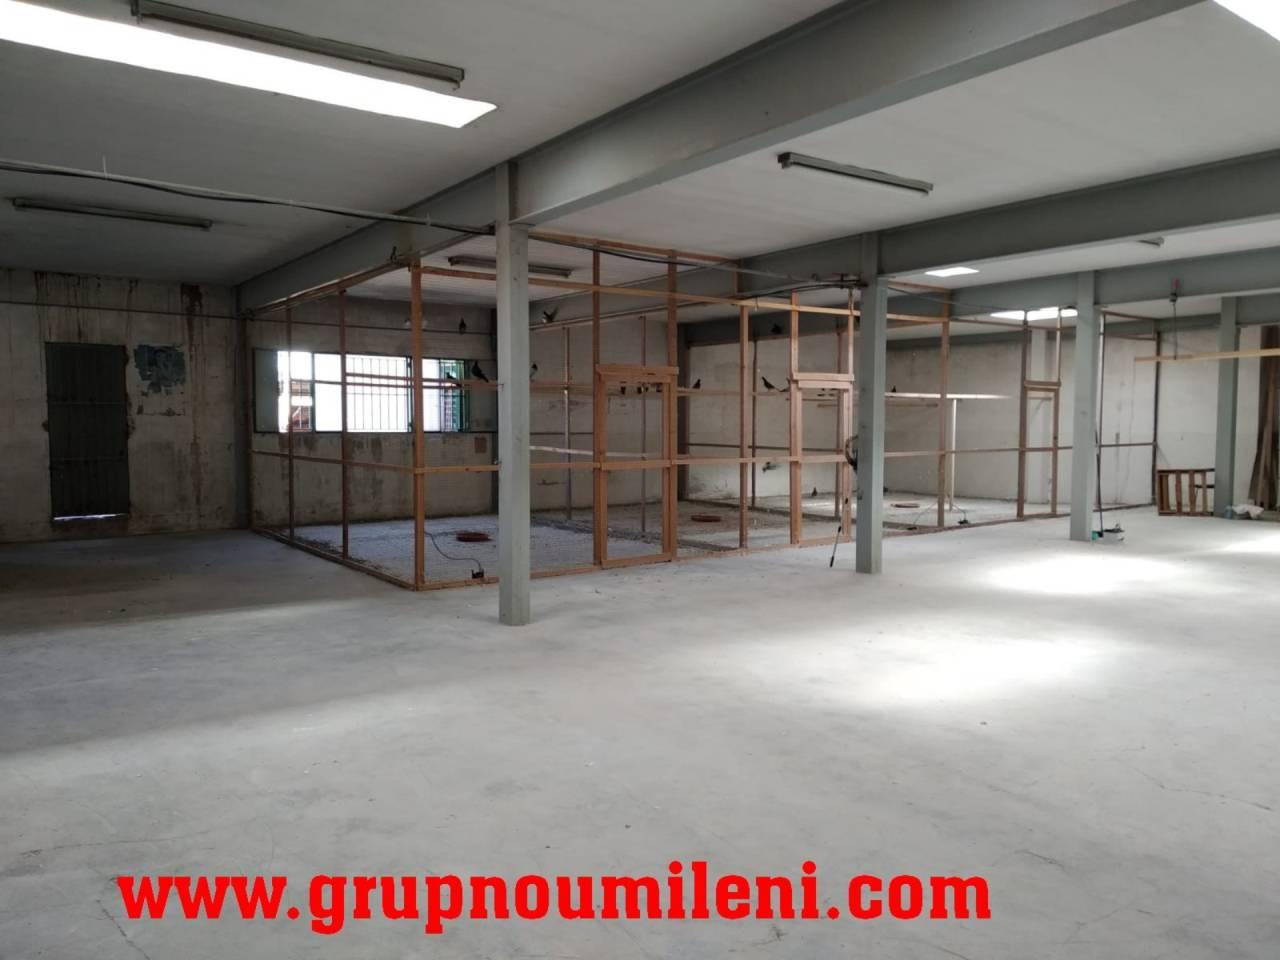 Nave industrial  Albal. Superficie total 1800 m², nave comercial superficie útil 1800 m²